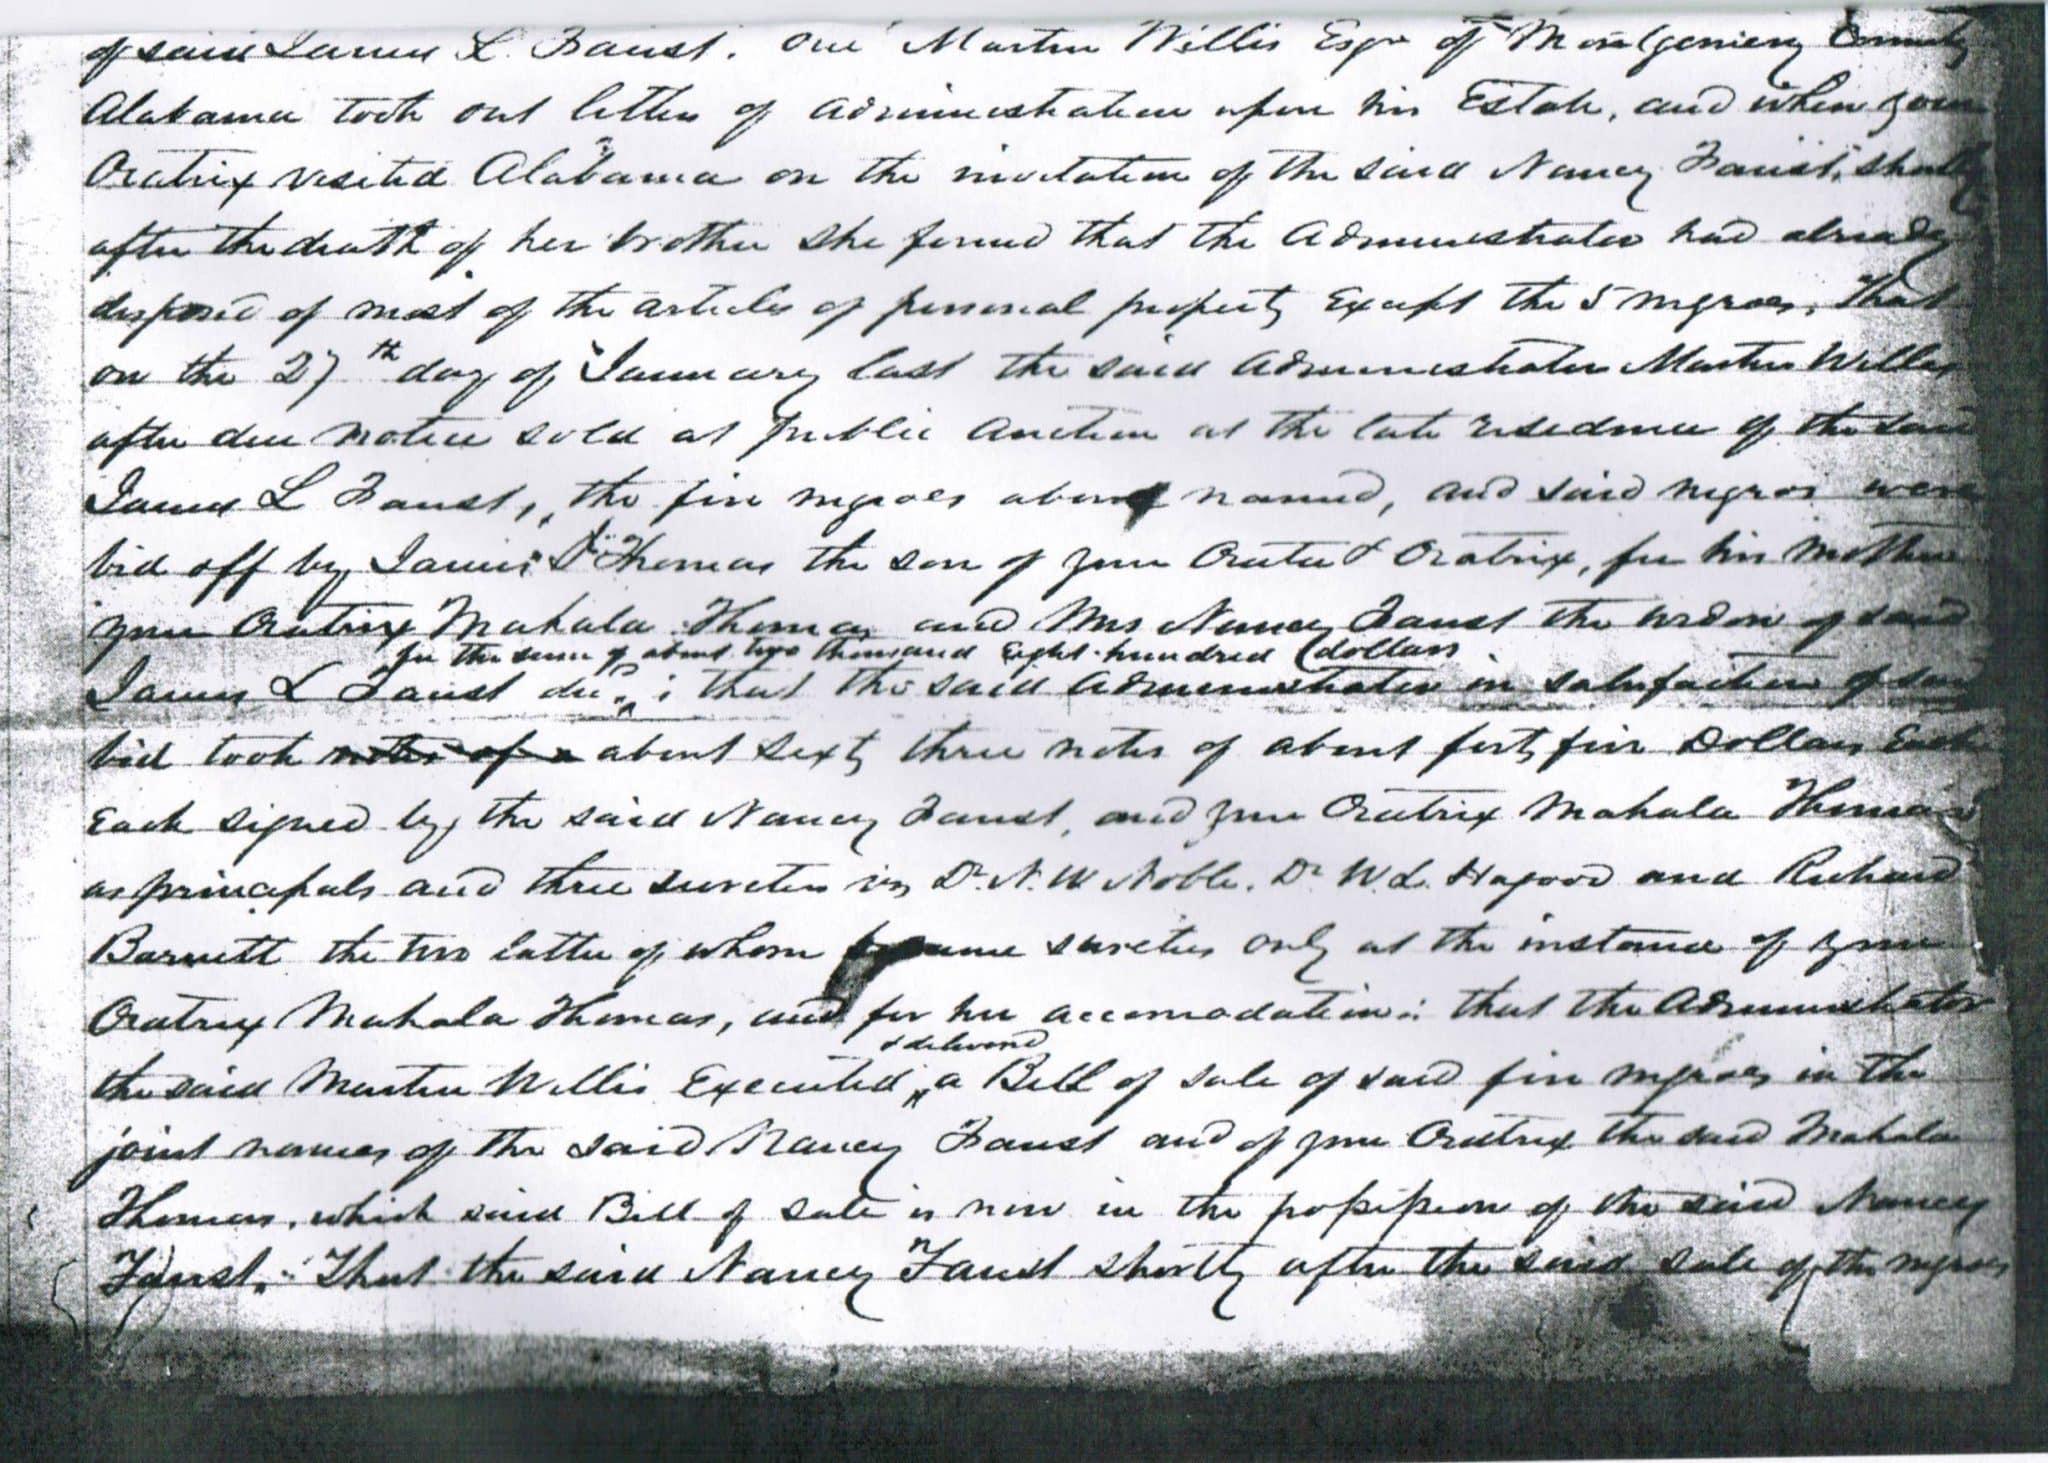 B&W scan of a small, handwritten document